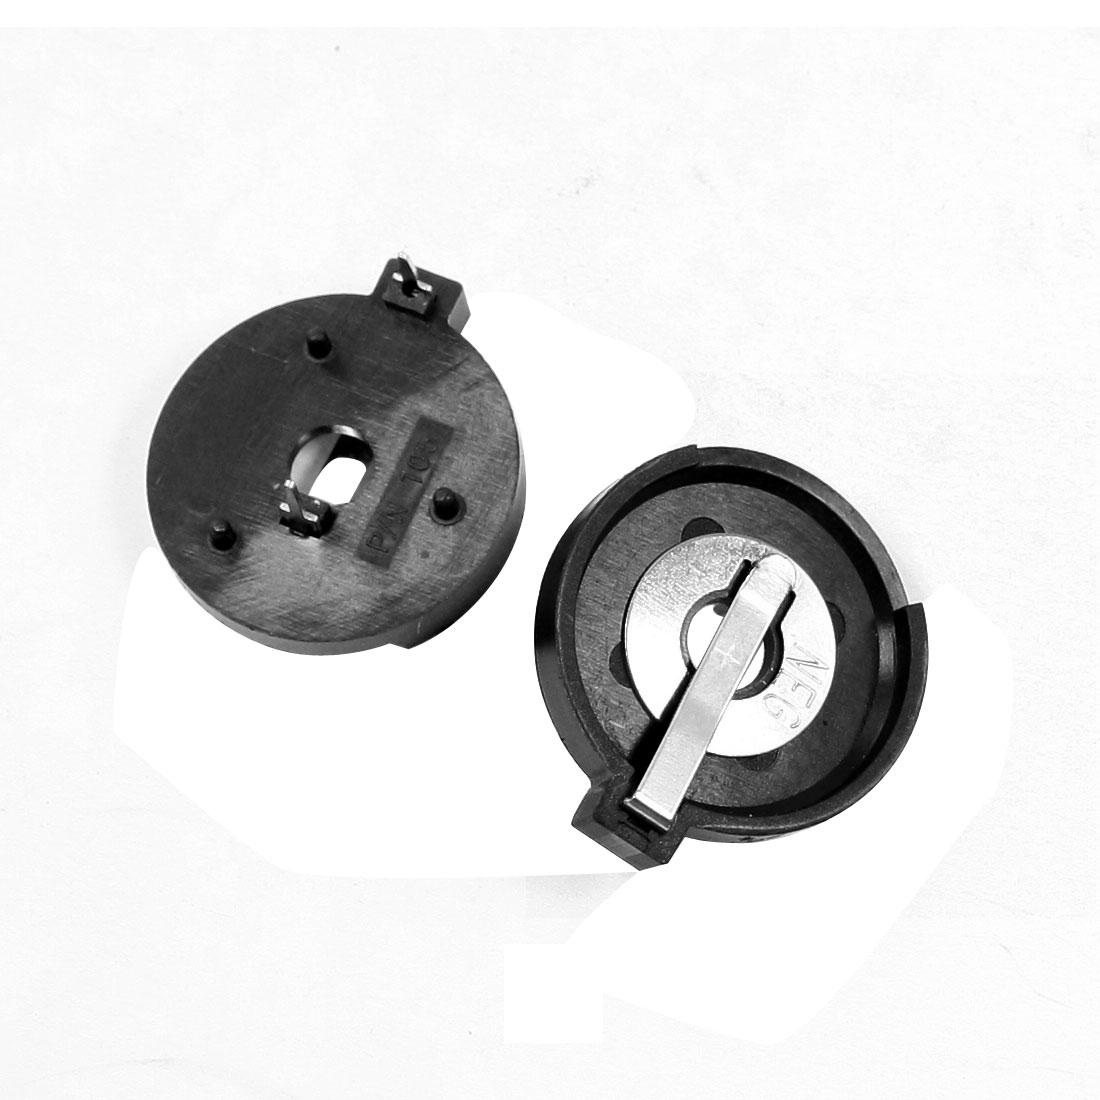 20mm Distance CR2430 LIR2430 Button Cell Battery Holder 2 Pieces